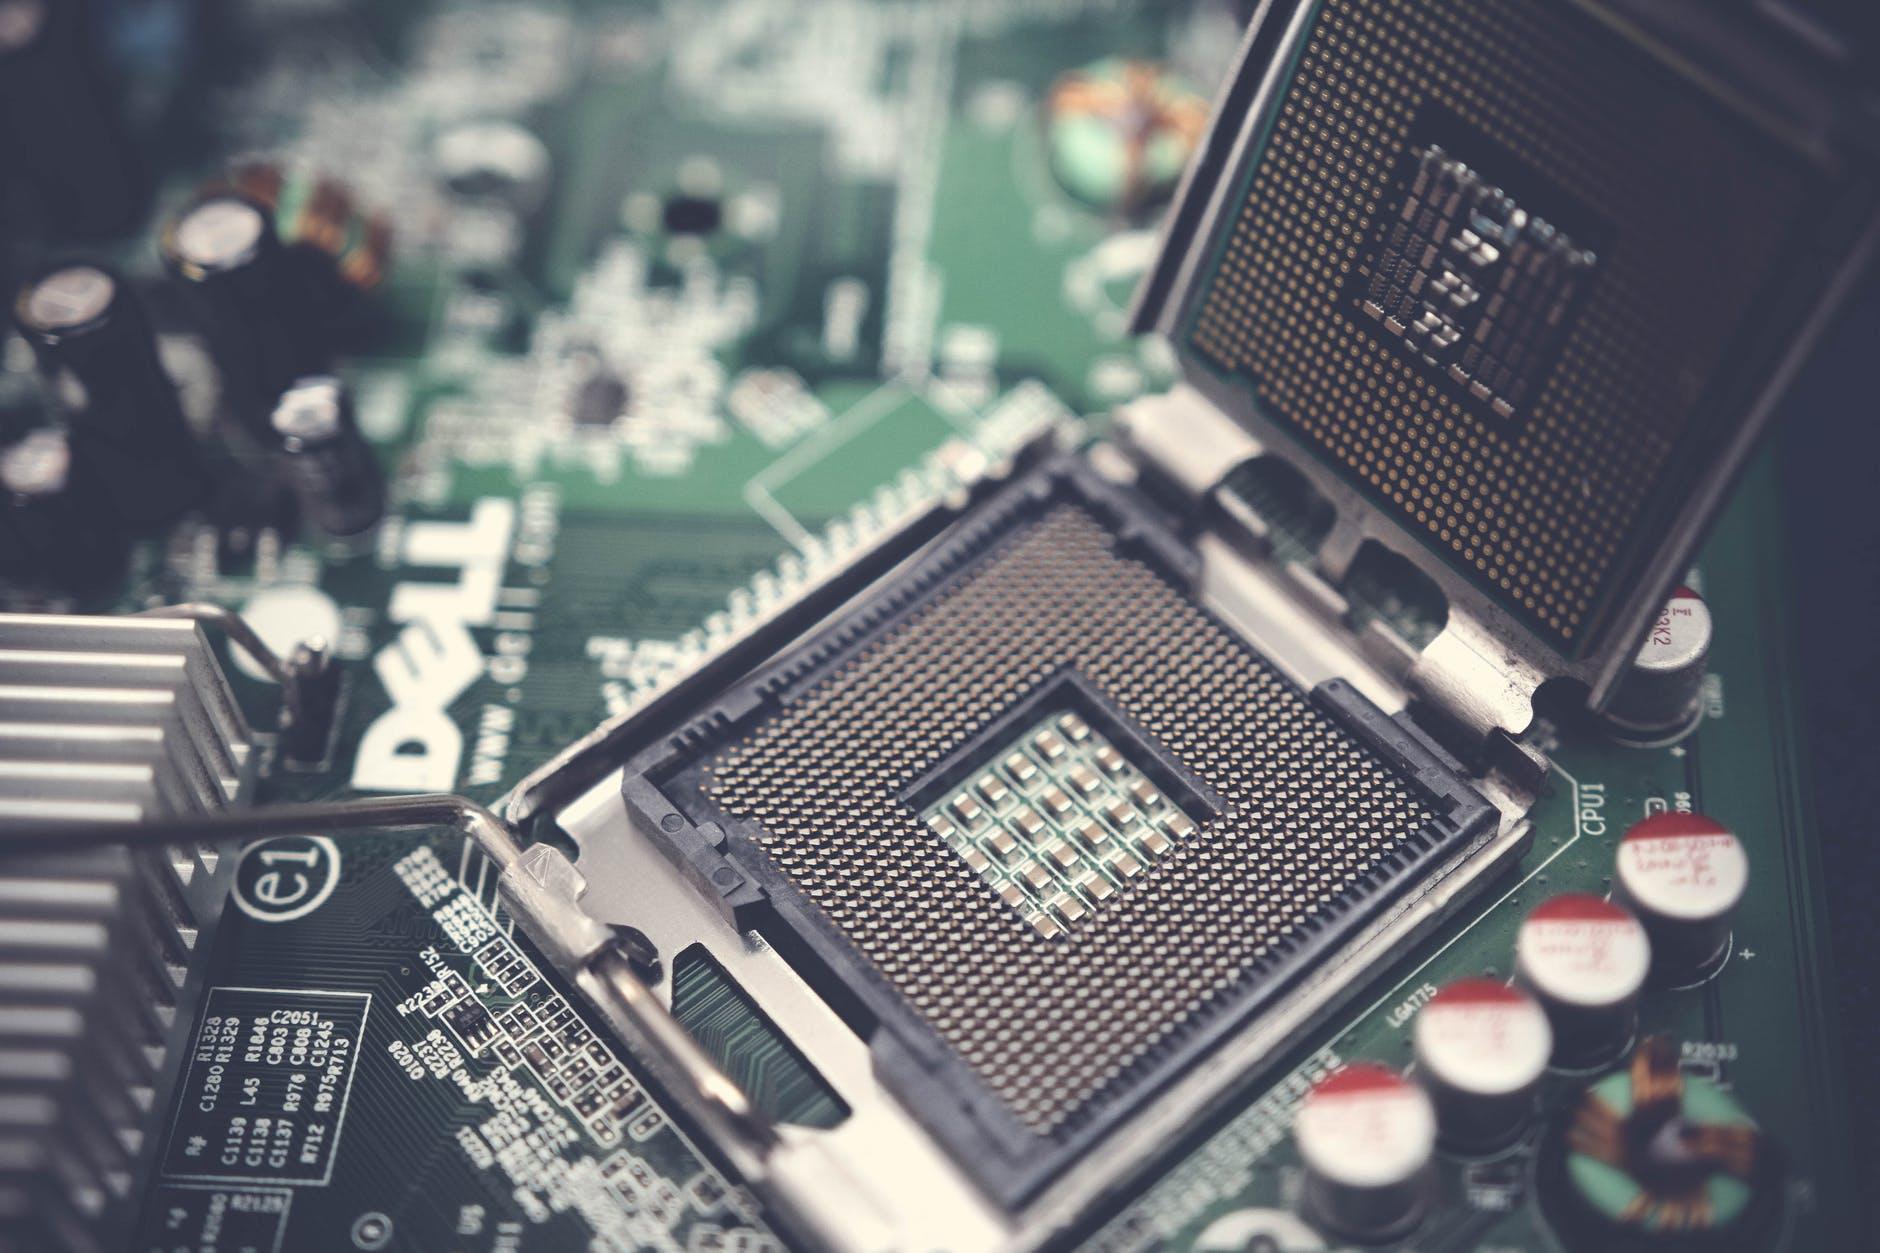 The Best Cheap PC Parts: Budget Components that Don't Sacrifice Performance